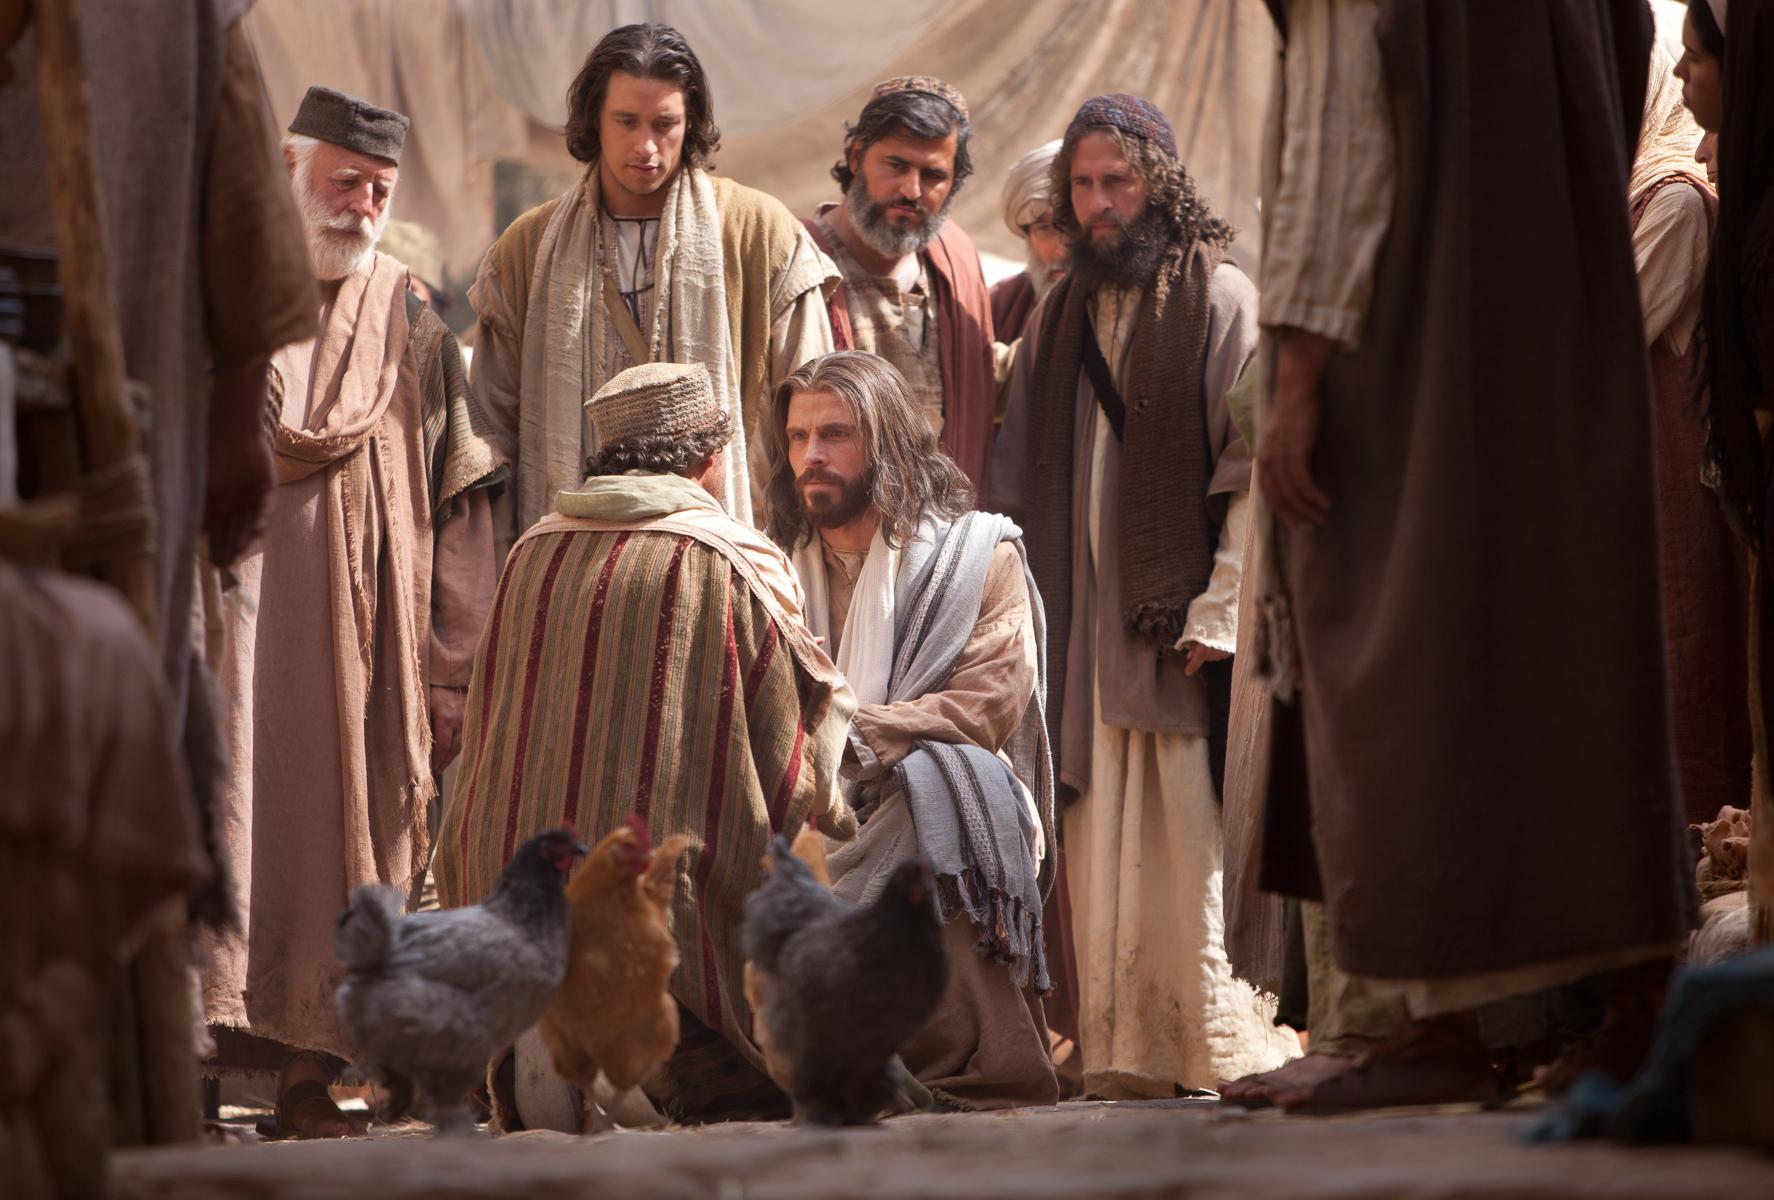 Jesús Resucita A La Hija De Jairo Jesús Levanta A La Hija De Jairo